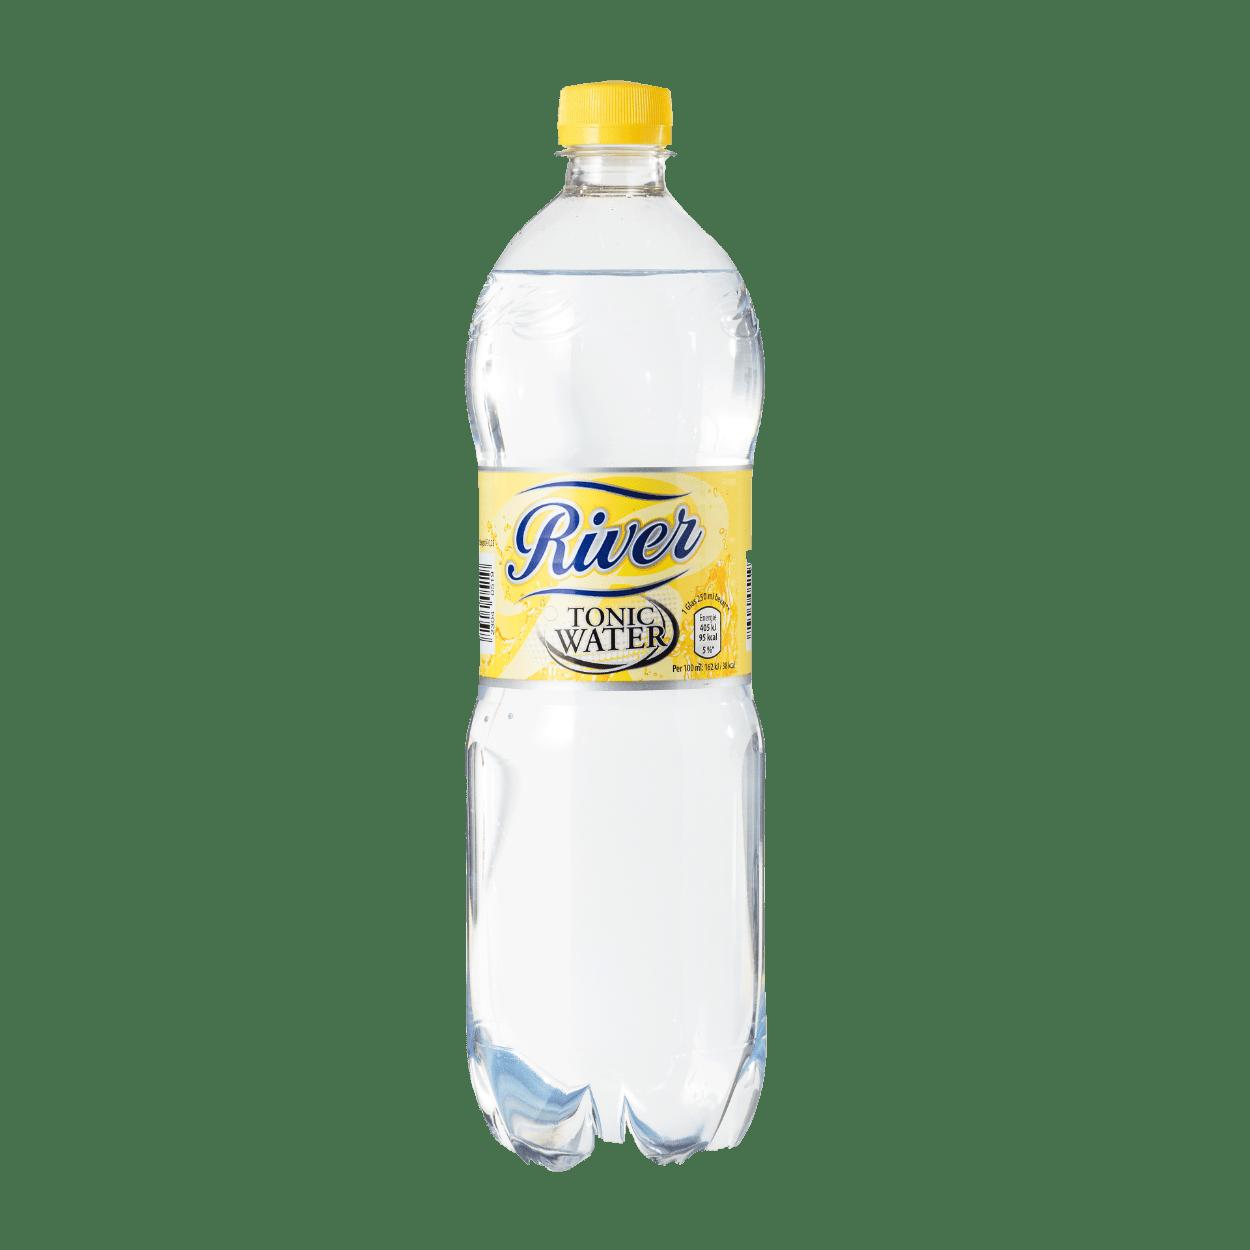 Lemontonic online dating